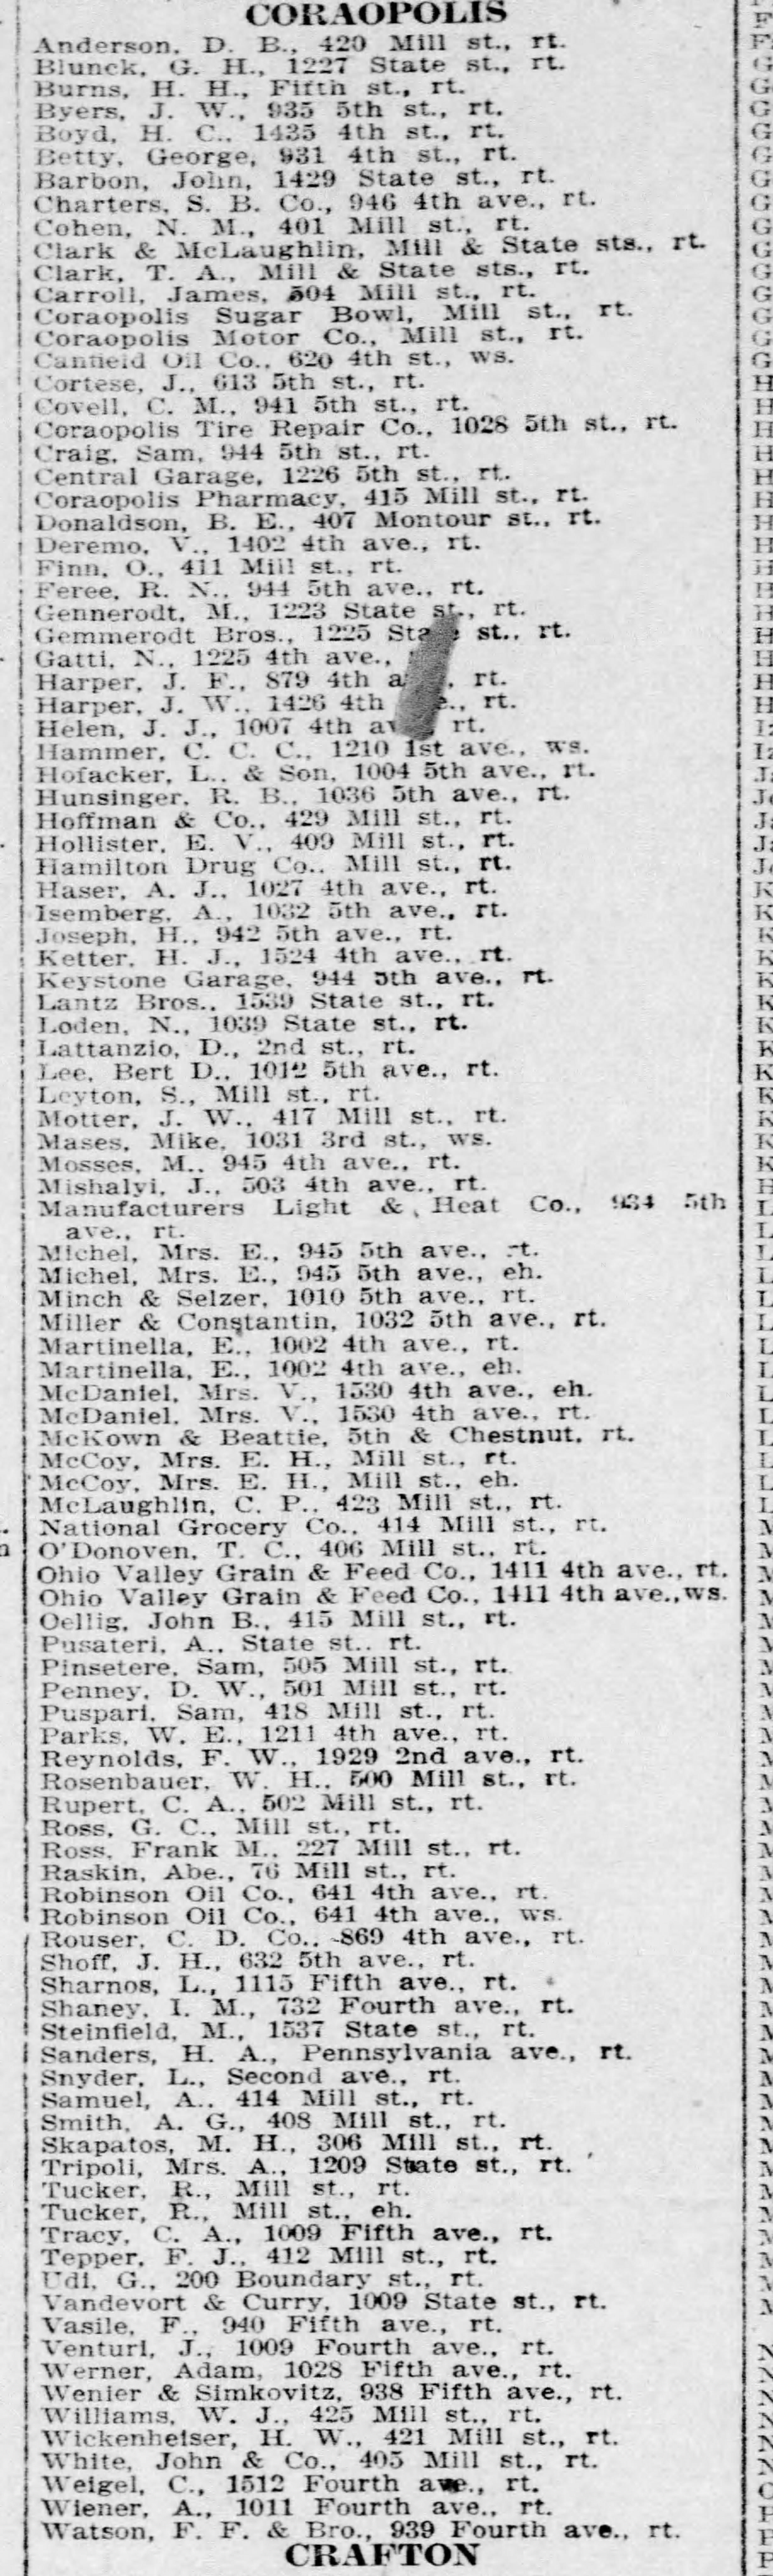 1916 - The_Pittsburgh_Press_Mon__Apr_24__1916_(2).jpg